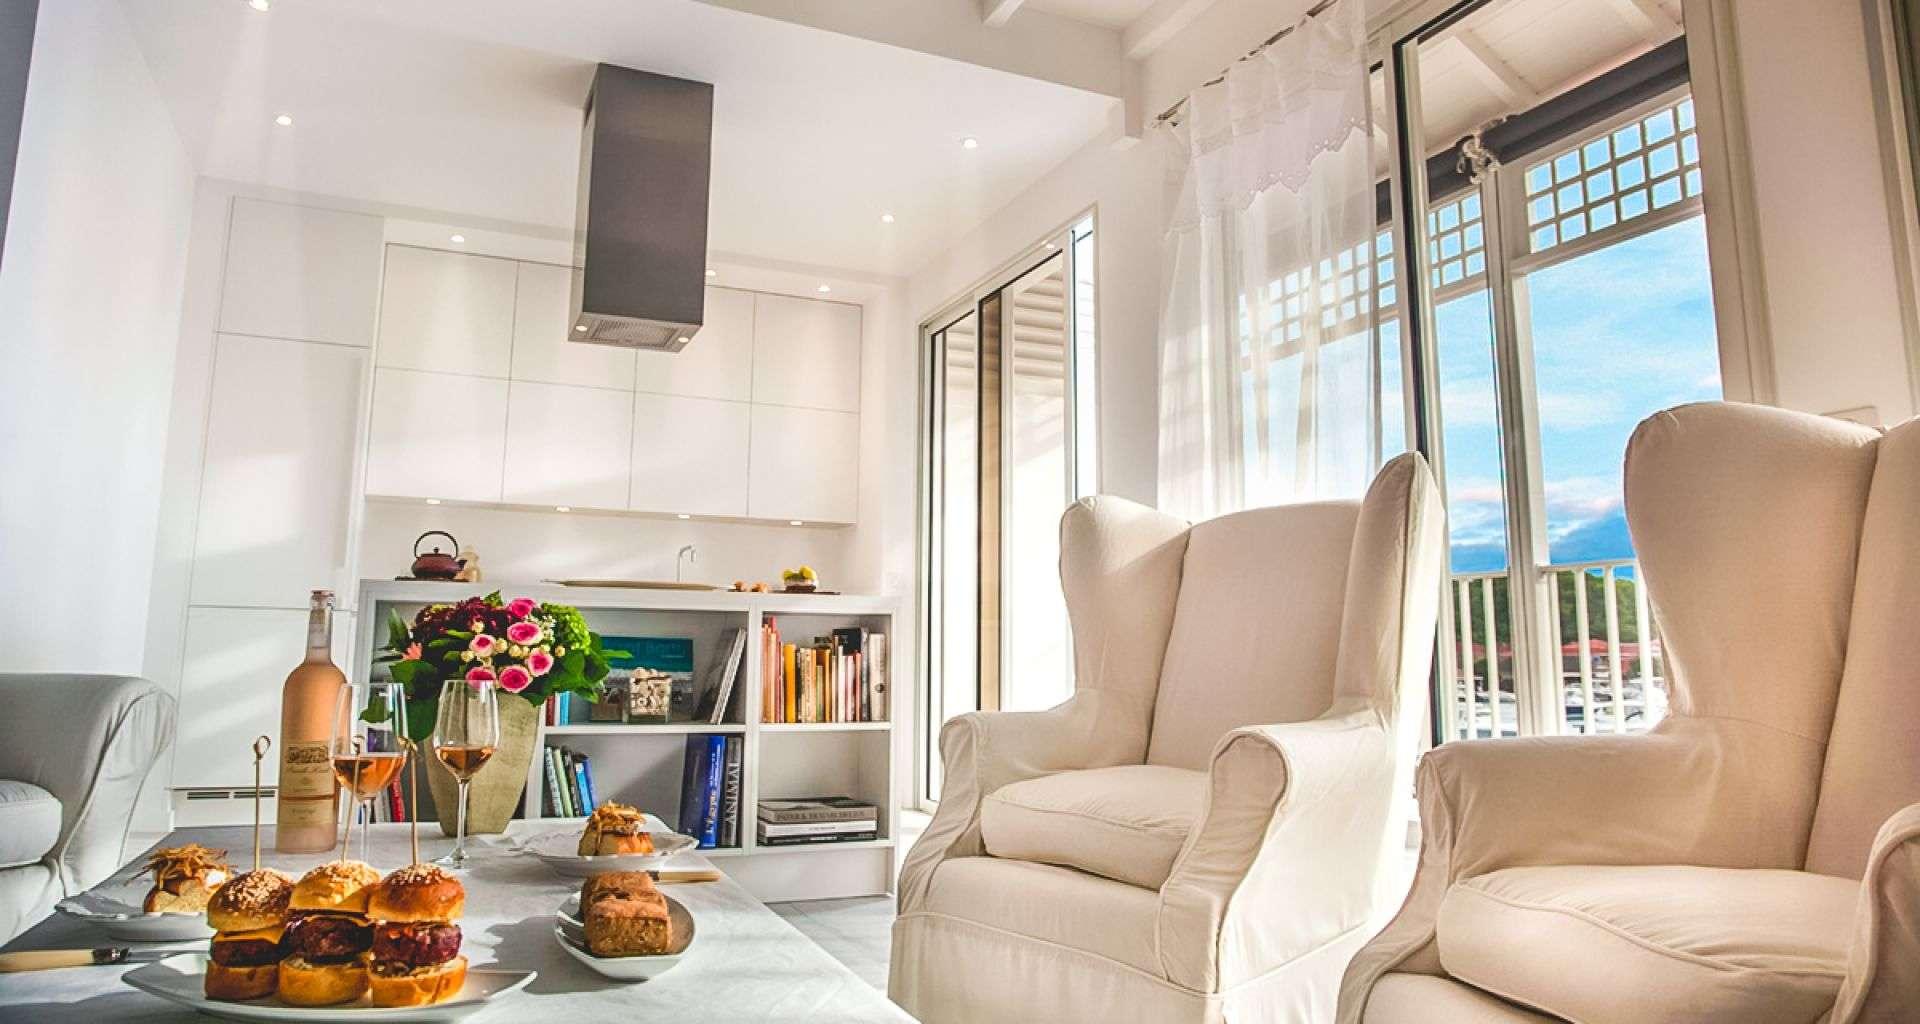 Luxury villa rentals caribbean - St barthelemy - Gustavia - No location 4 - Harbor Haven - Image 1/11